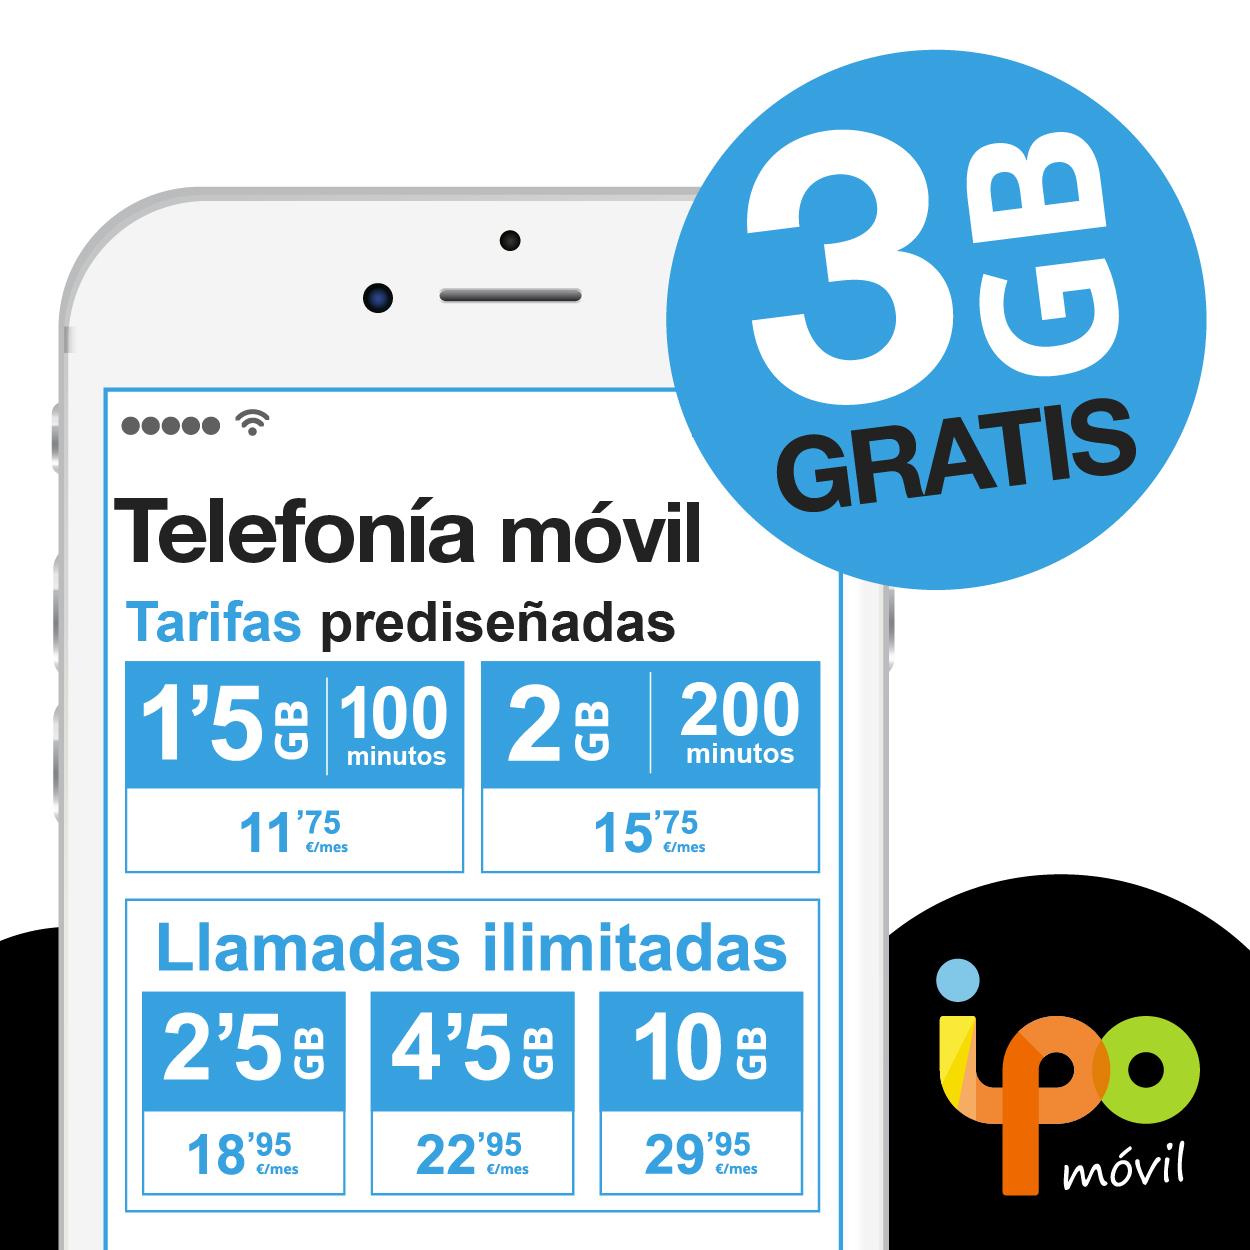 Nuevas tarifas ipo networks - tarifas prediseñadas